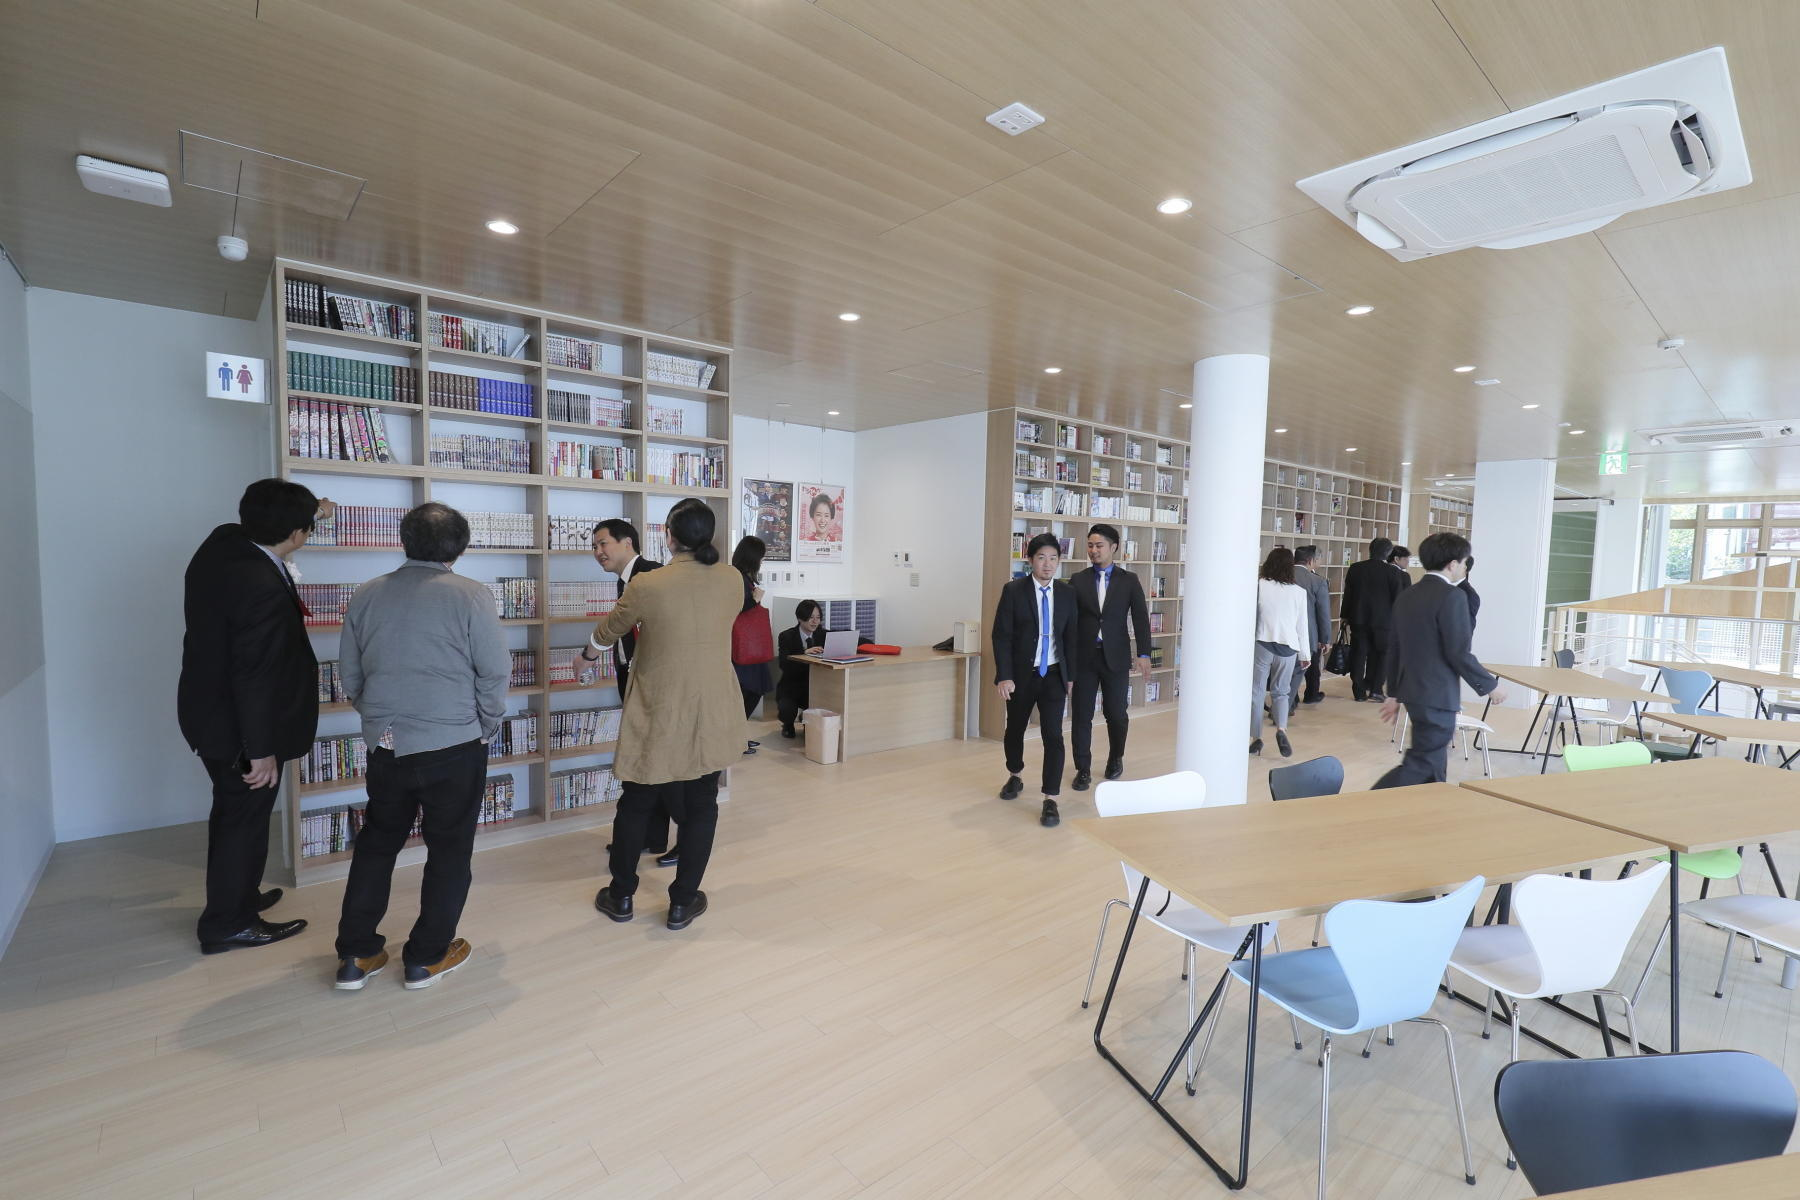 http://news.yoshimoto.co.jp/20180409184802-82c4d317694eeea02428307c6b41ab838fc3751d.jpg